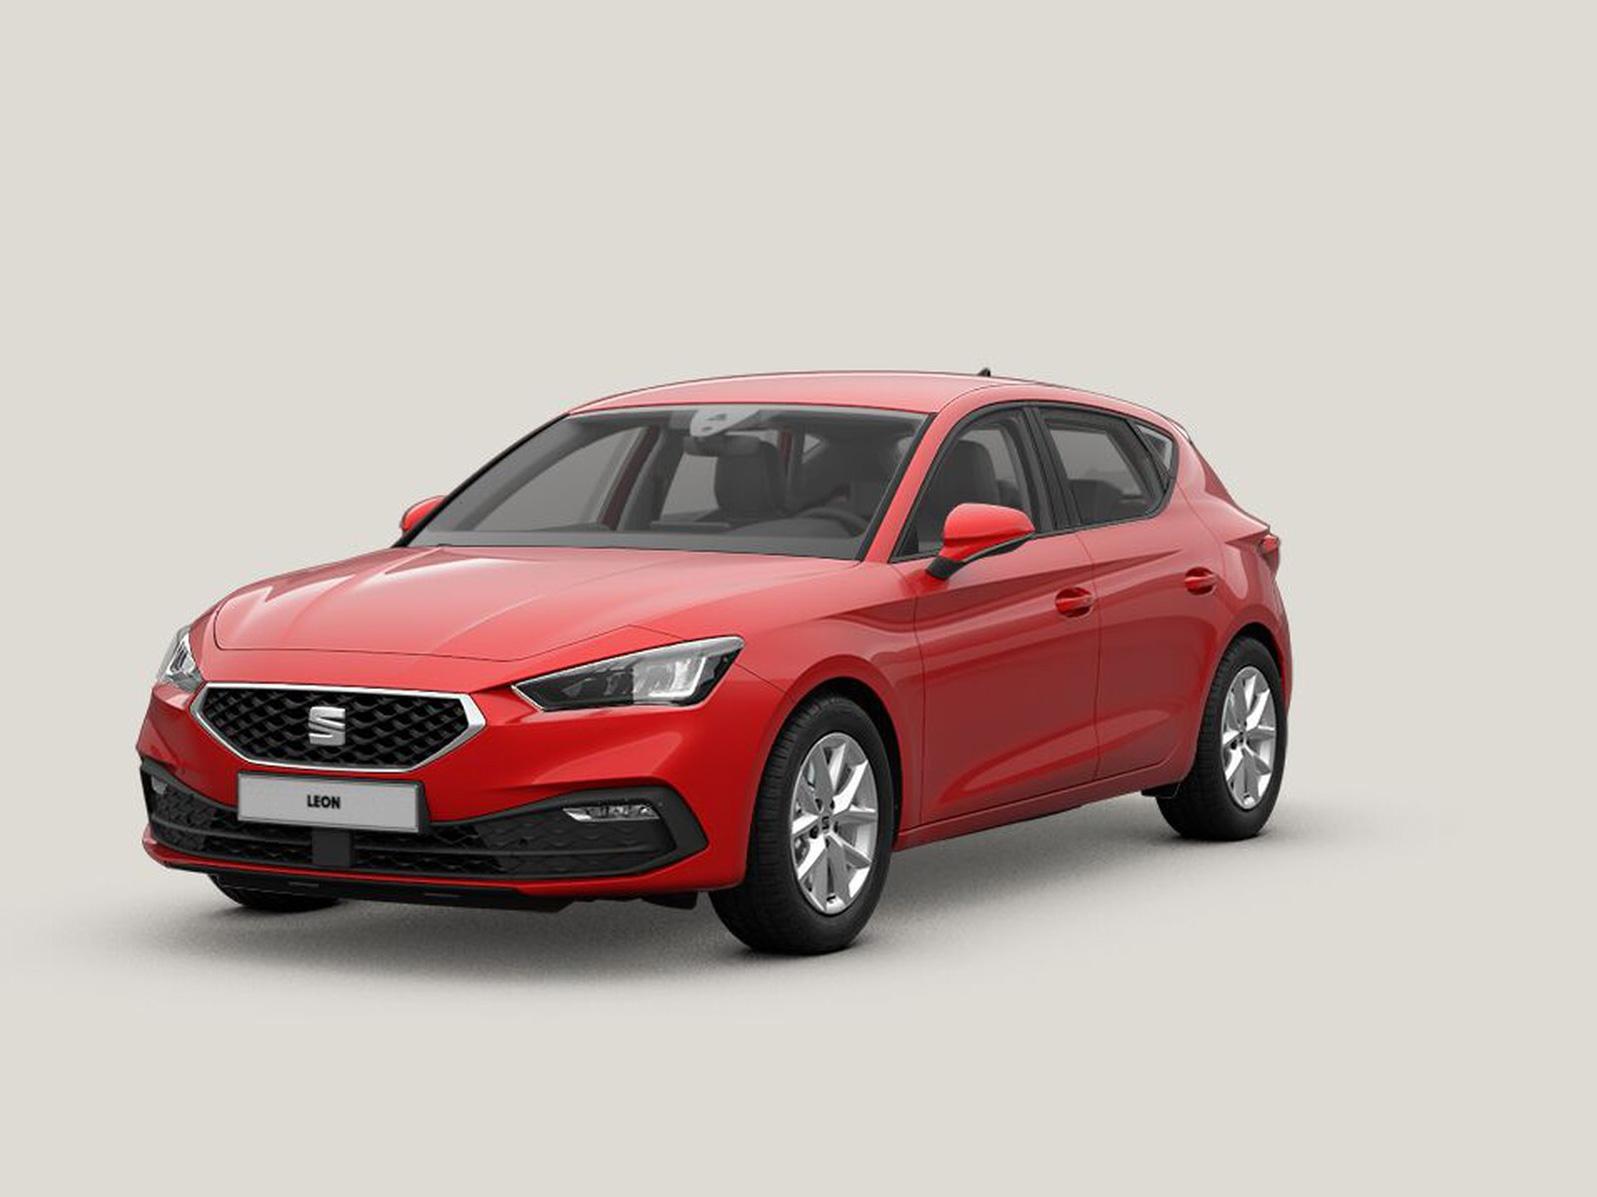 Offerta Speciale Nuova Seat Leon 1.0 TSI Style